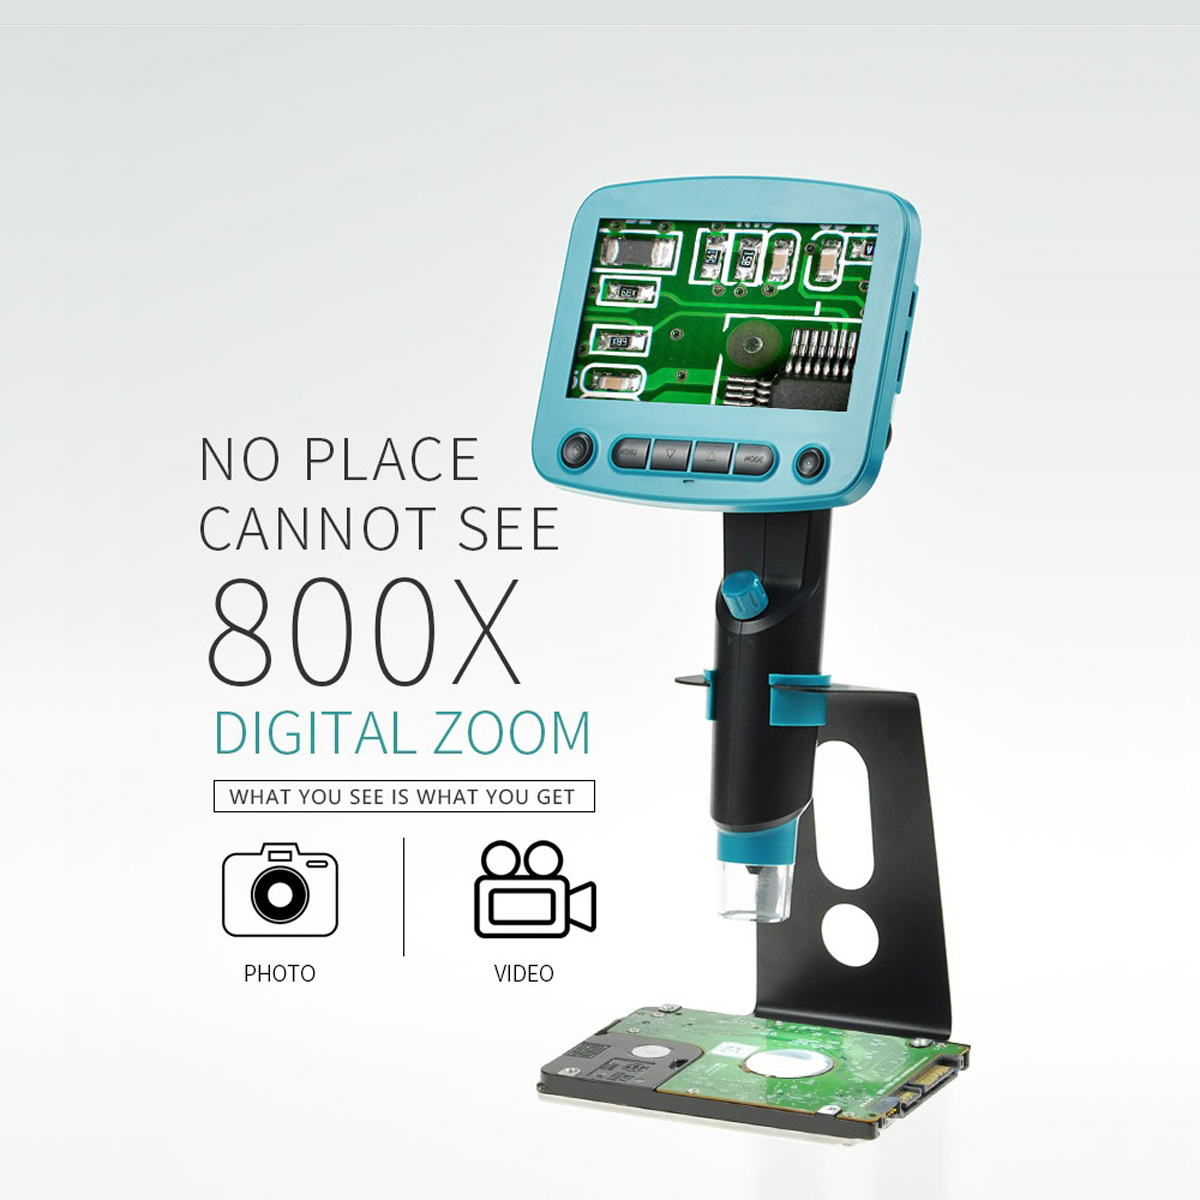 800X USB digital LCD microscope 4.3 inch HD OLED Portable 8 LED VGA Camera Video microscopes soldering mikroskop Magnifier